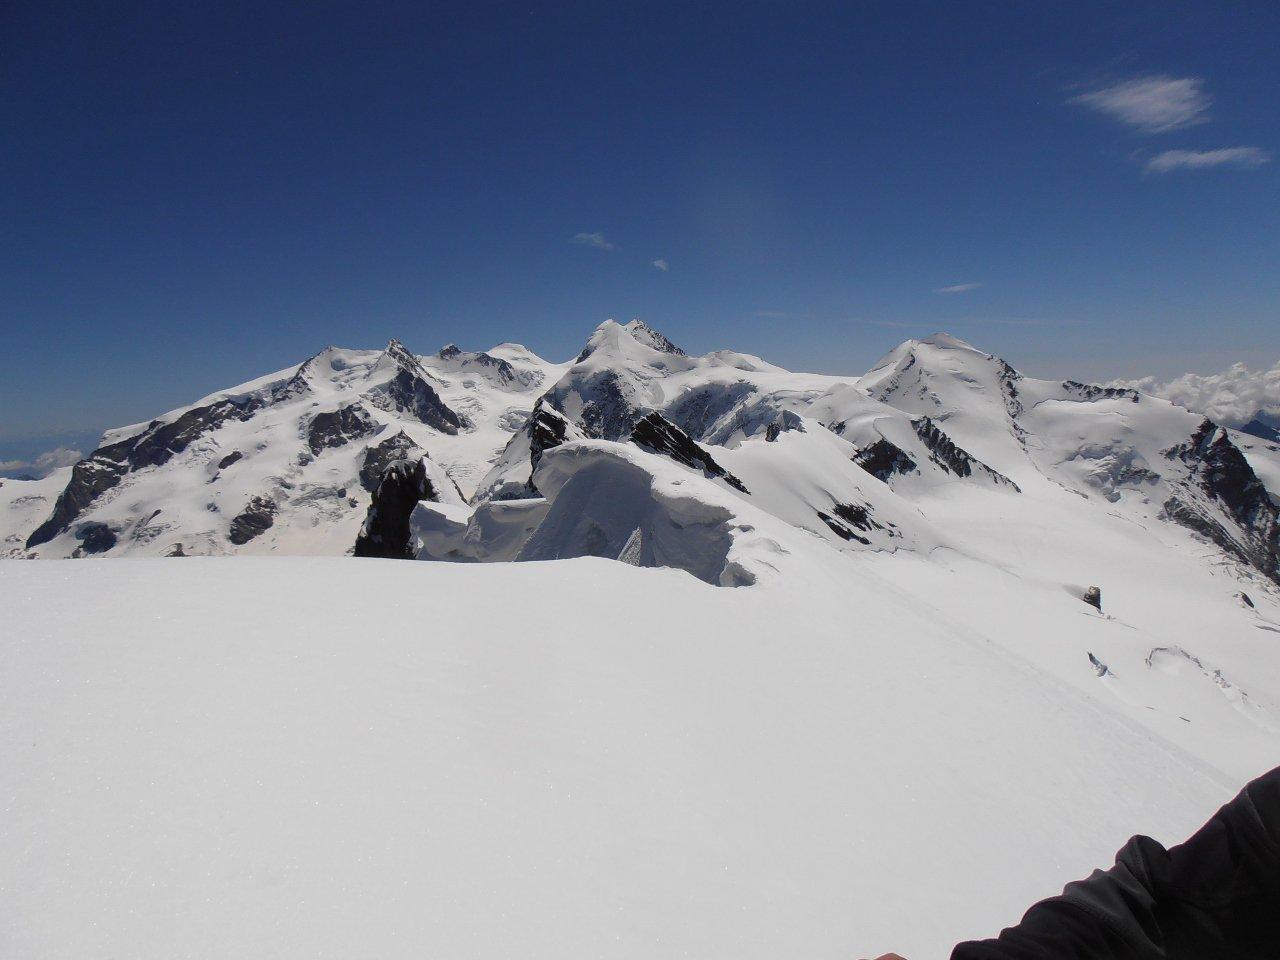 07 - le cime orientali del Monte Rosa viste dal Breithorn Centrale